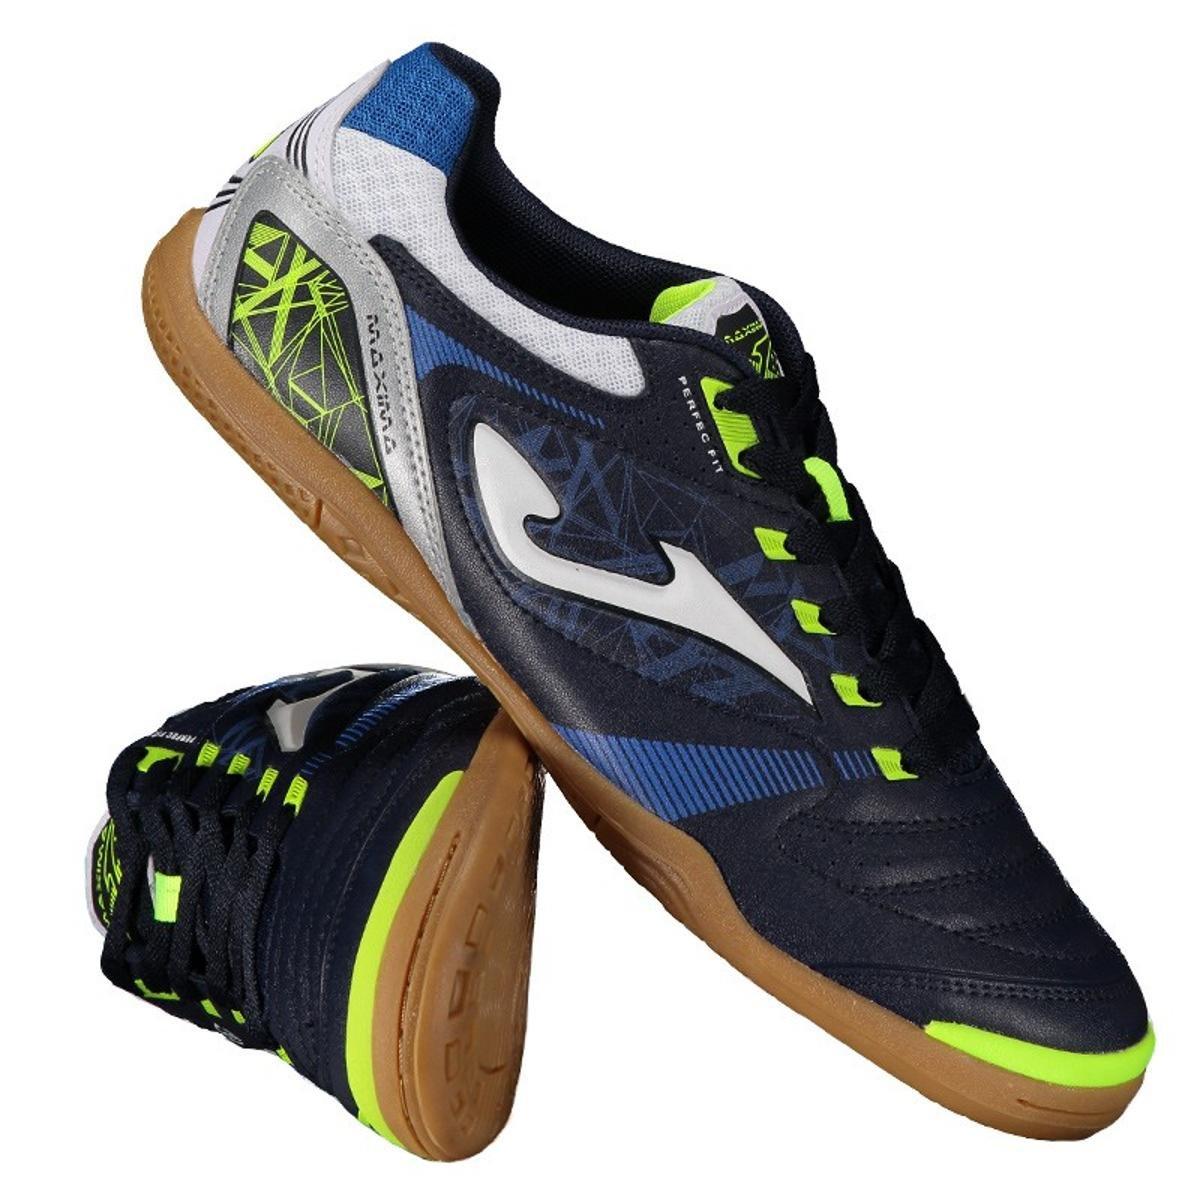 23b8b8b87b Chuteira Joma Maxima Futsal Masculina - Compre Agora